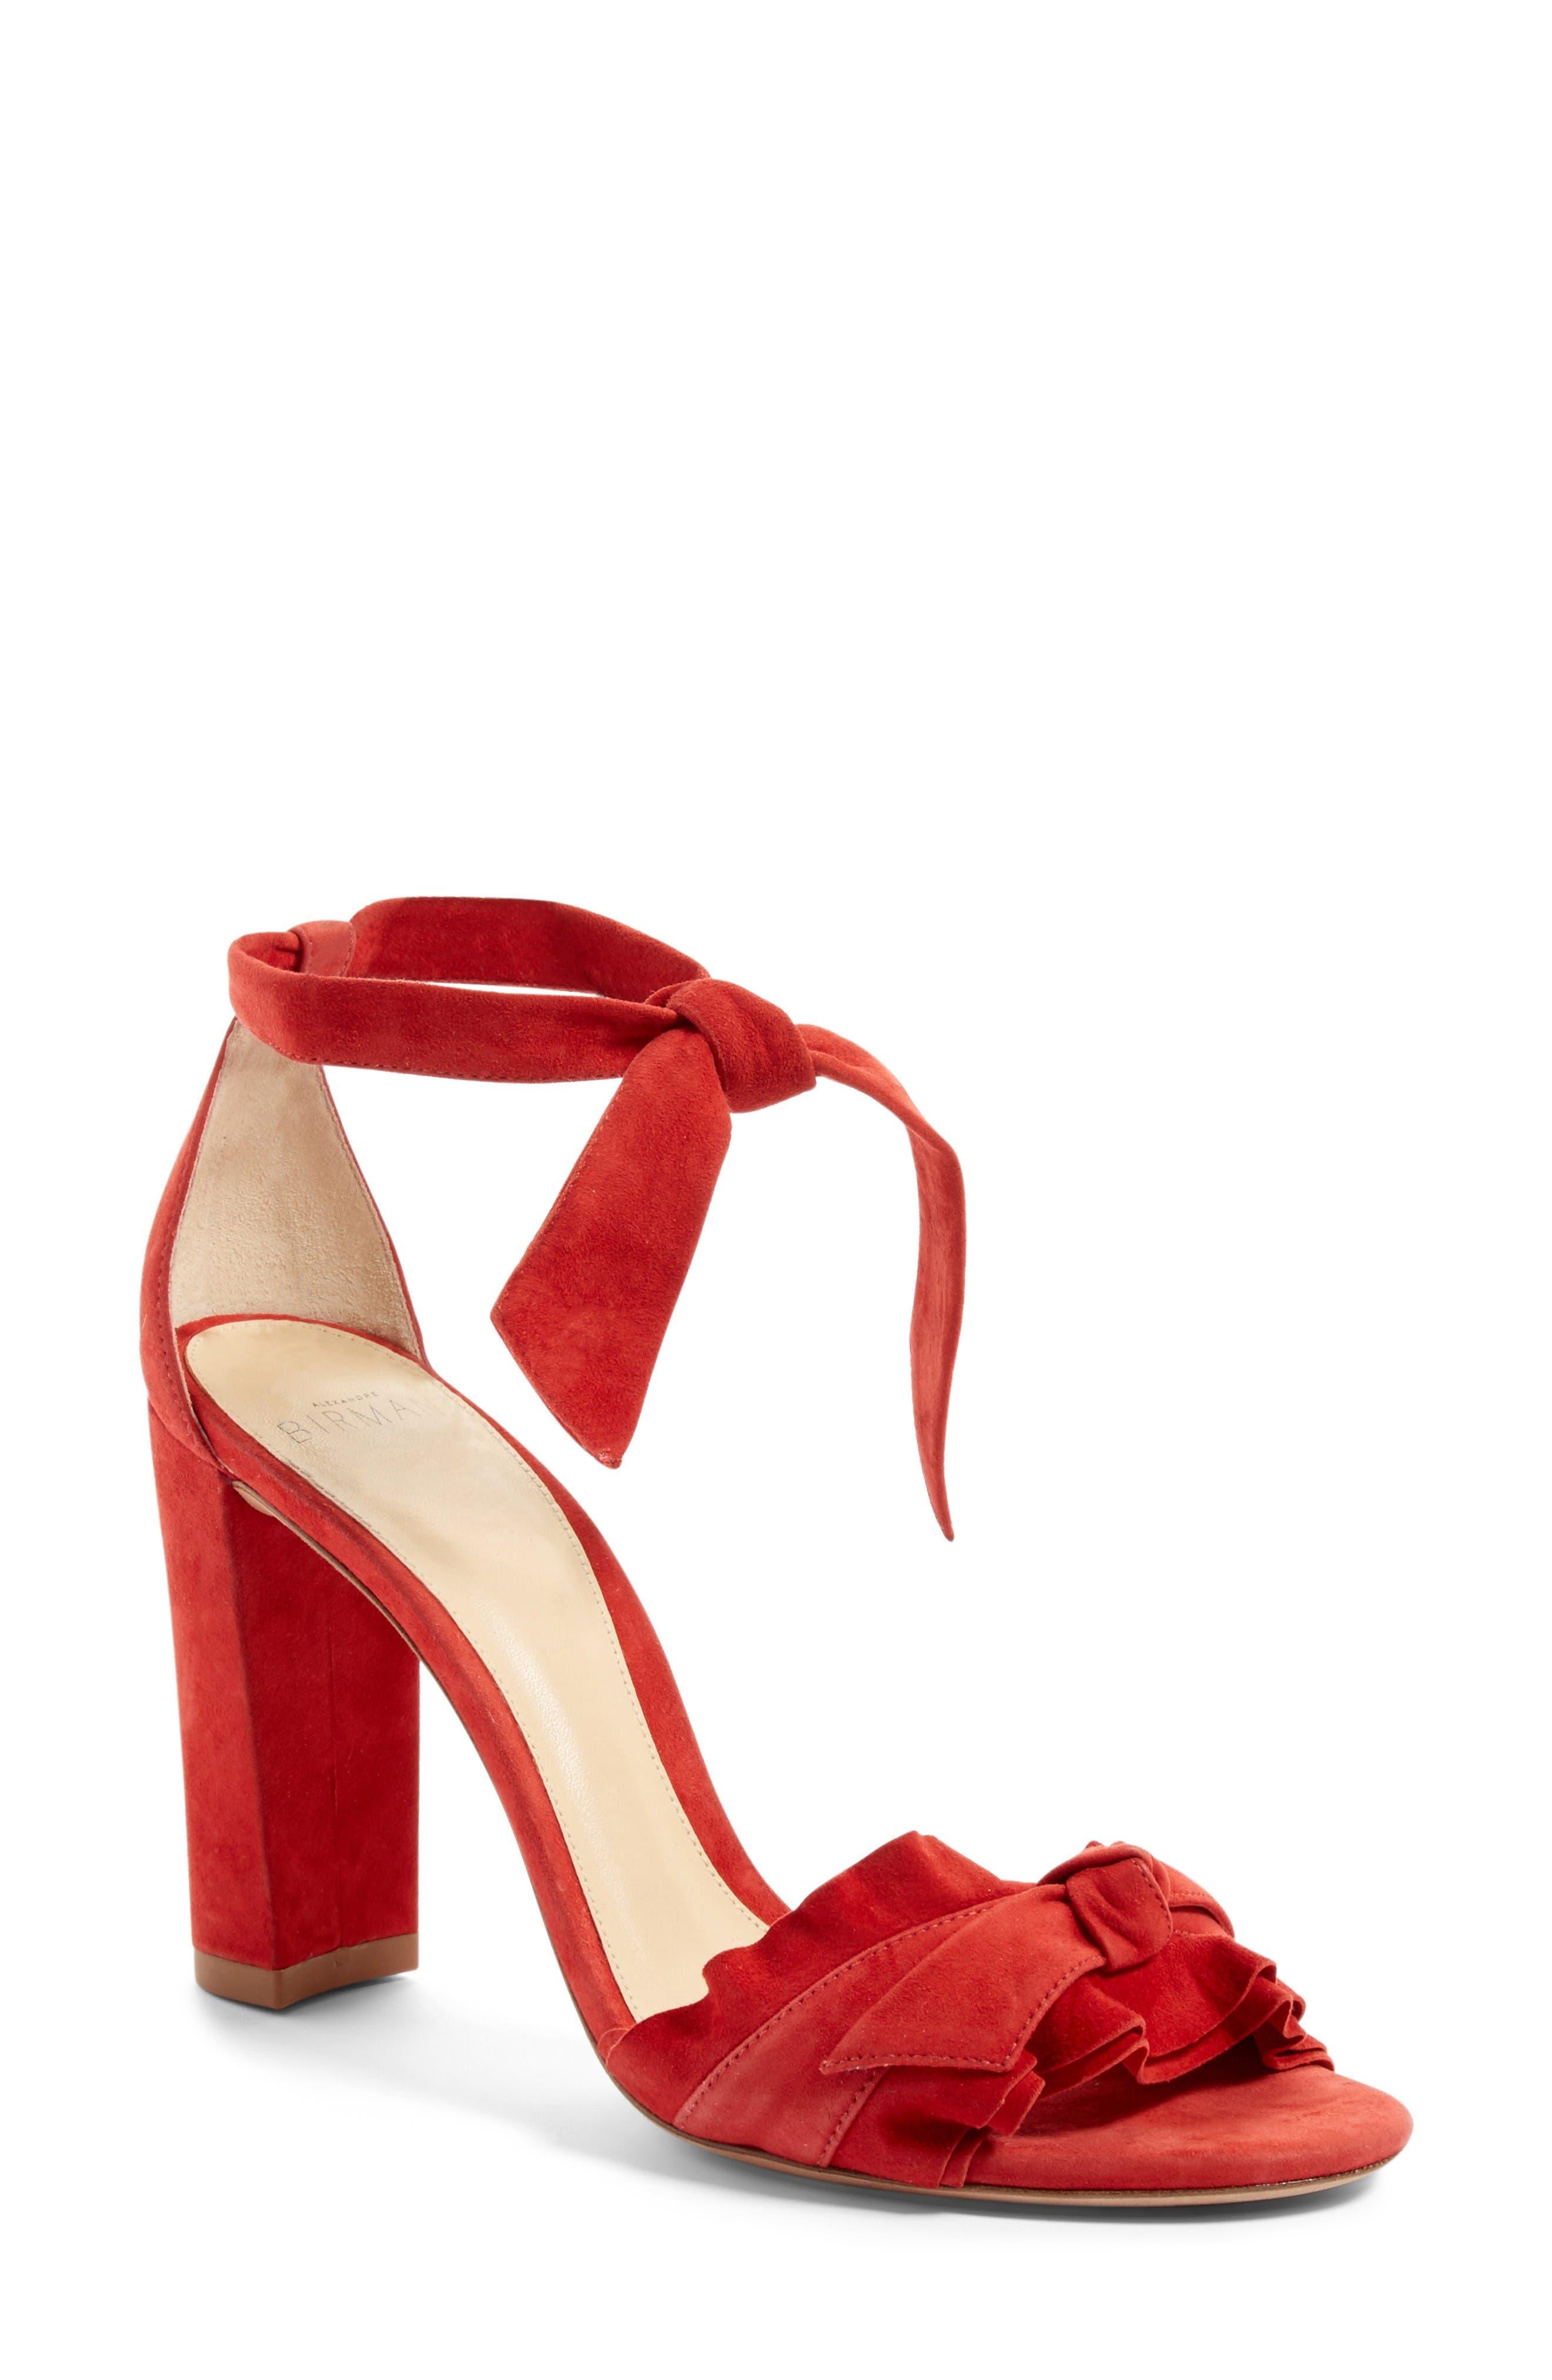 Main Image - Alexandre Birman Lupita Block Heel Sandal (Women)